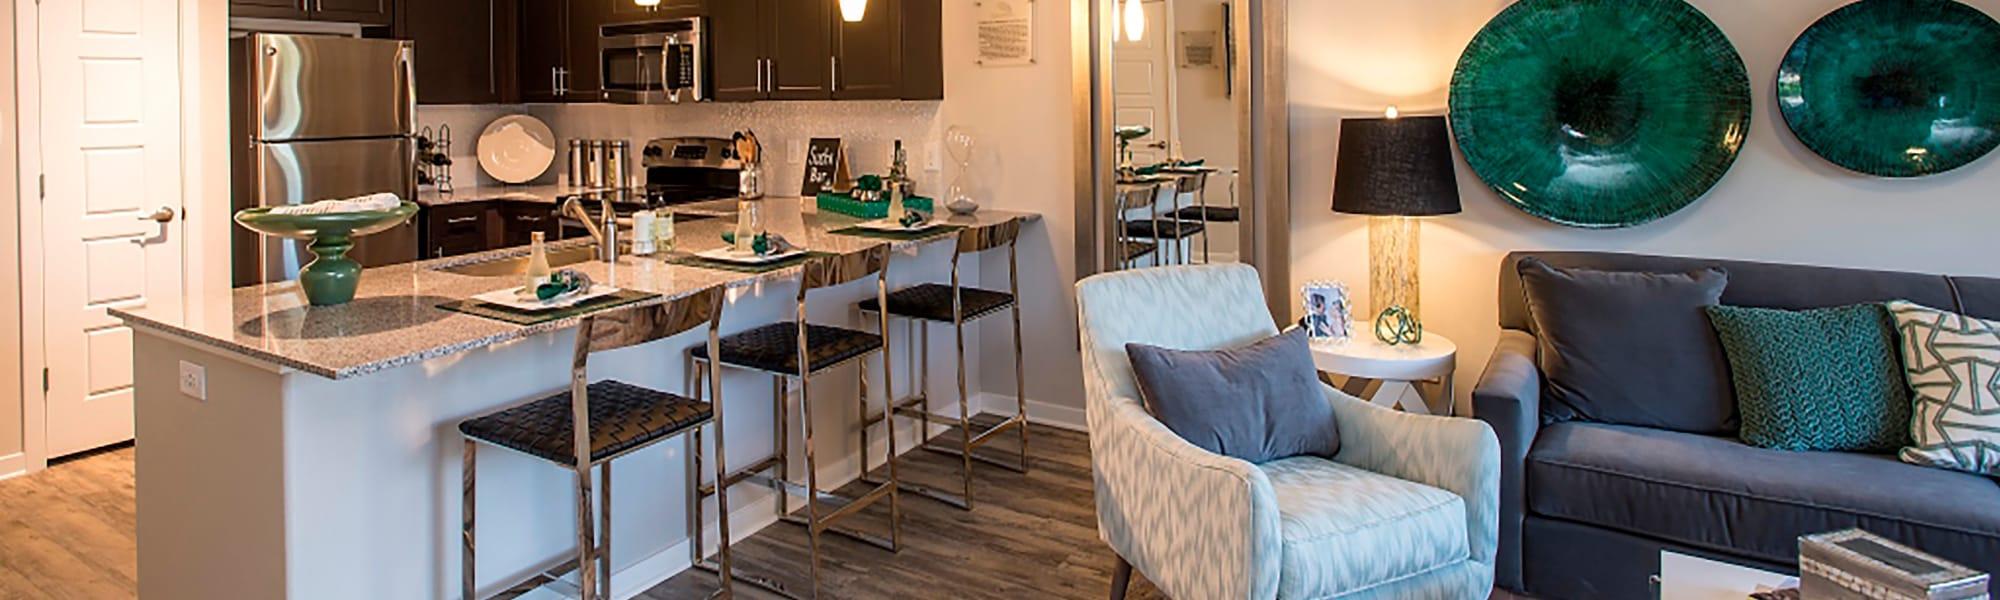 Photos of Luxe Scottsdale Apartments in Scottsdale, Arizona